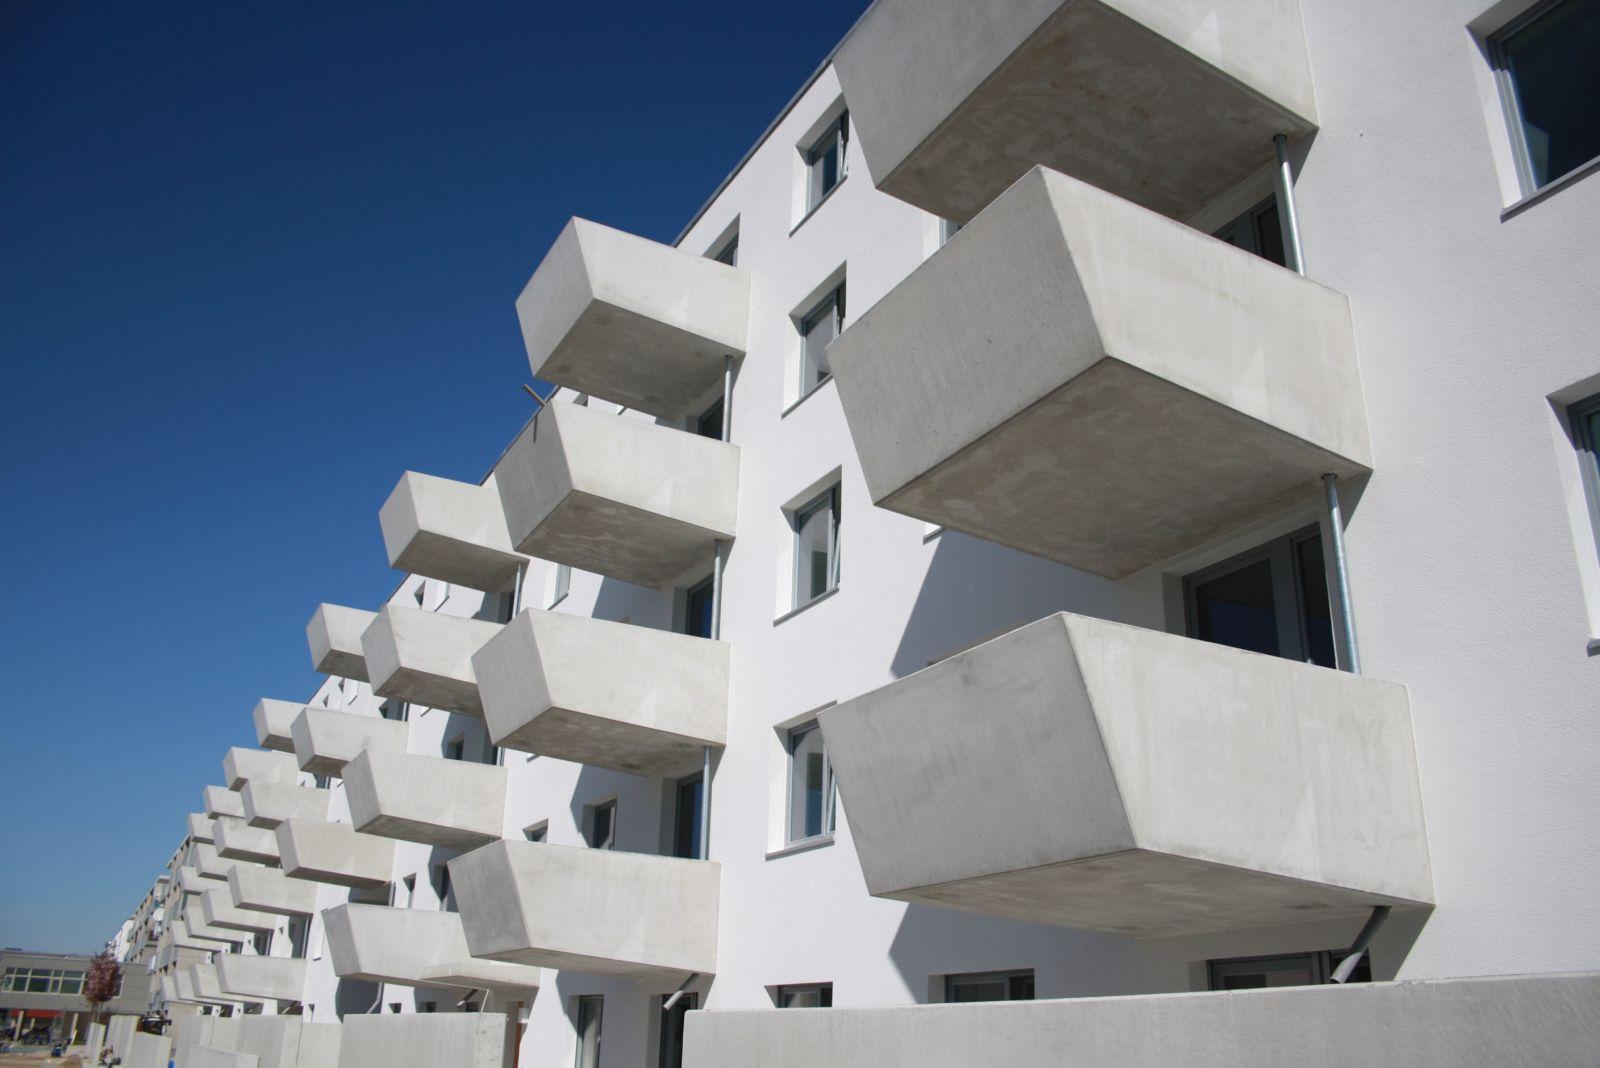 immobilien münchen messestadt